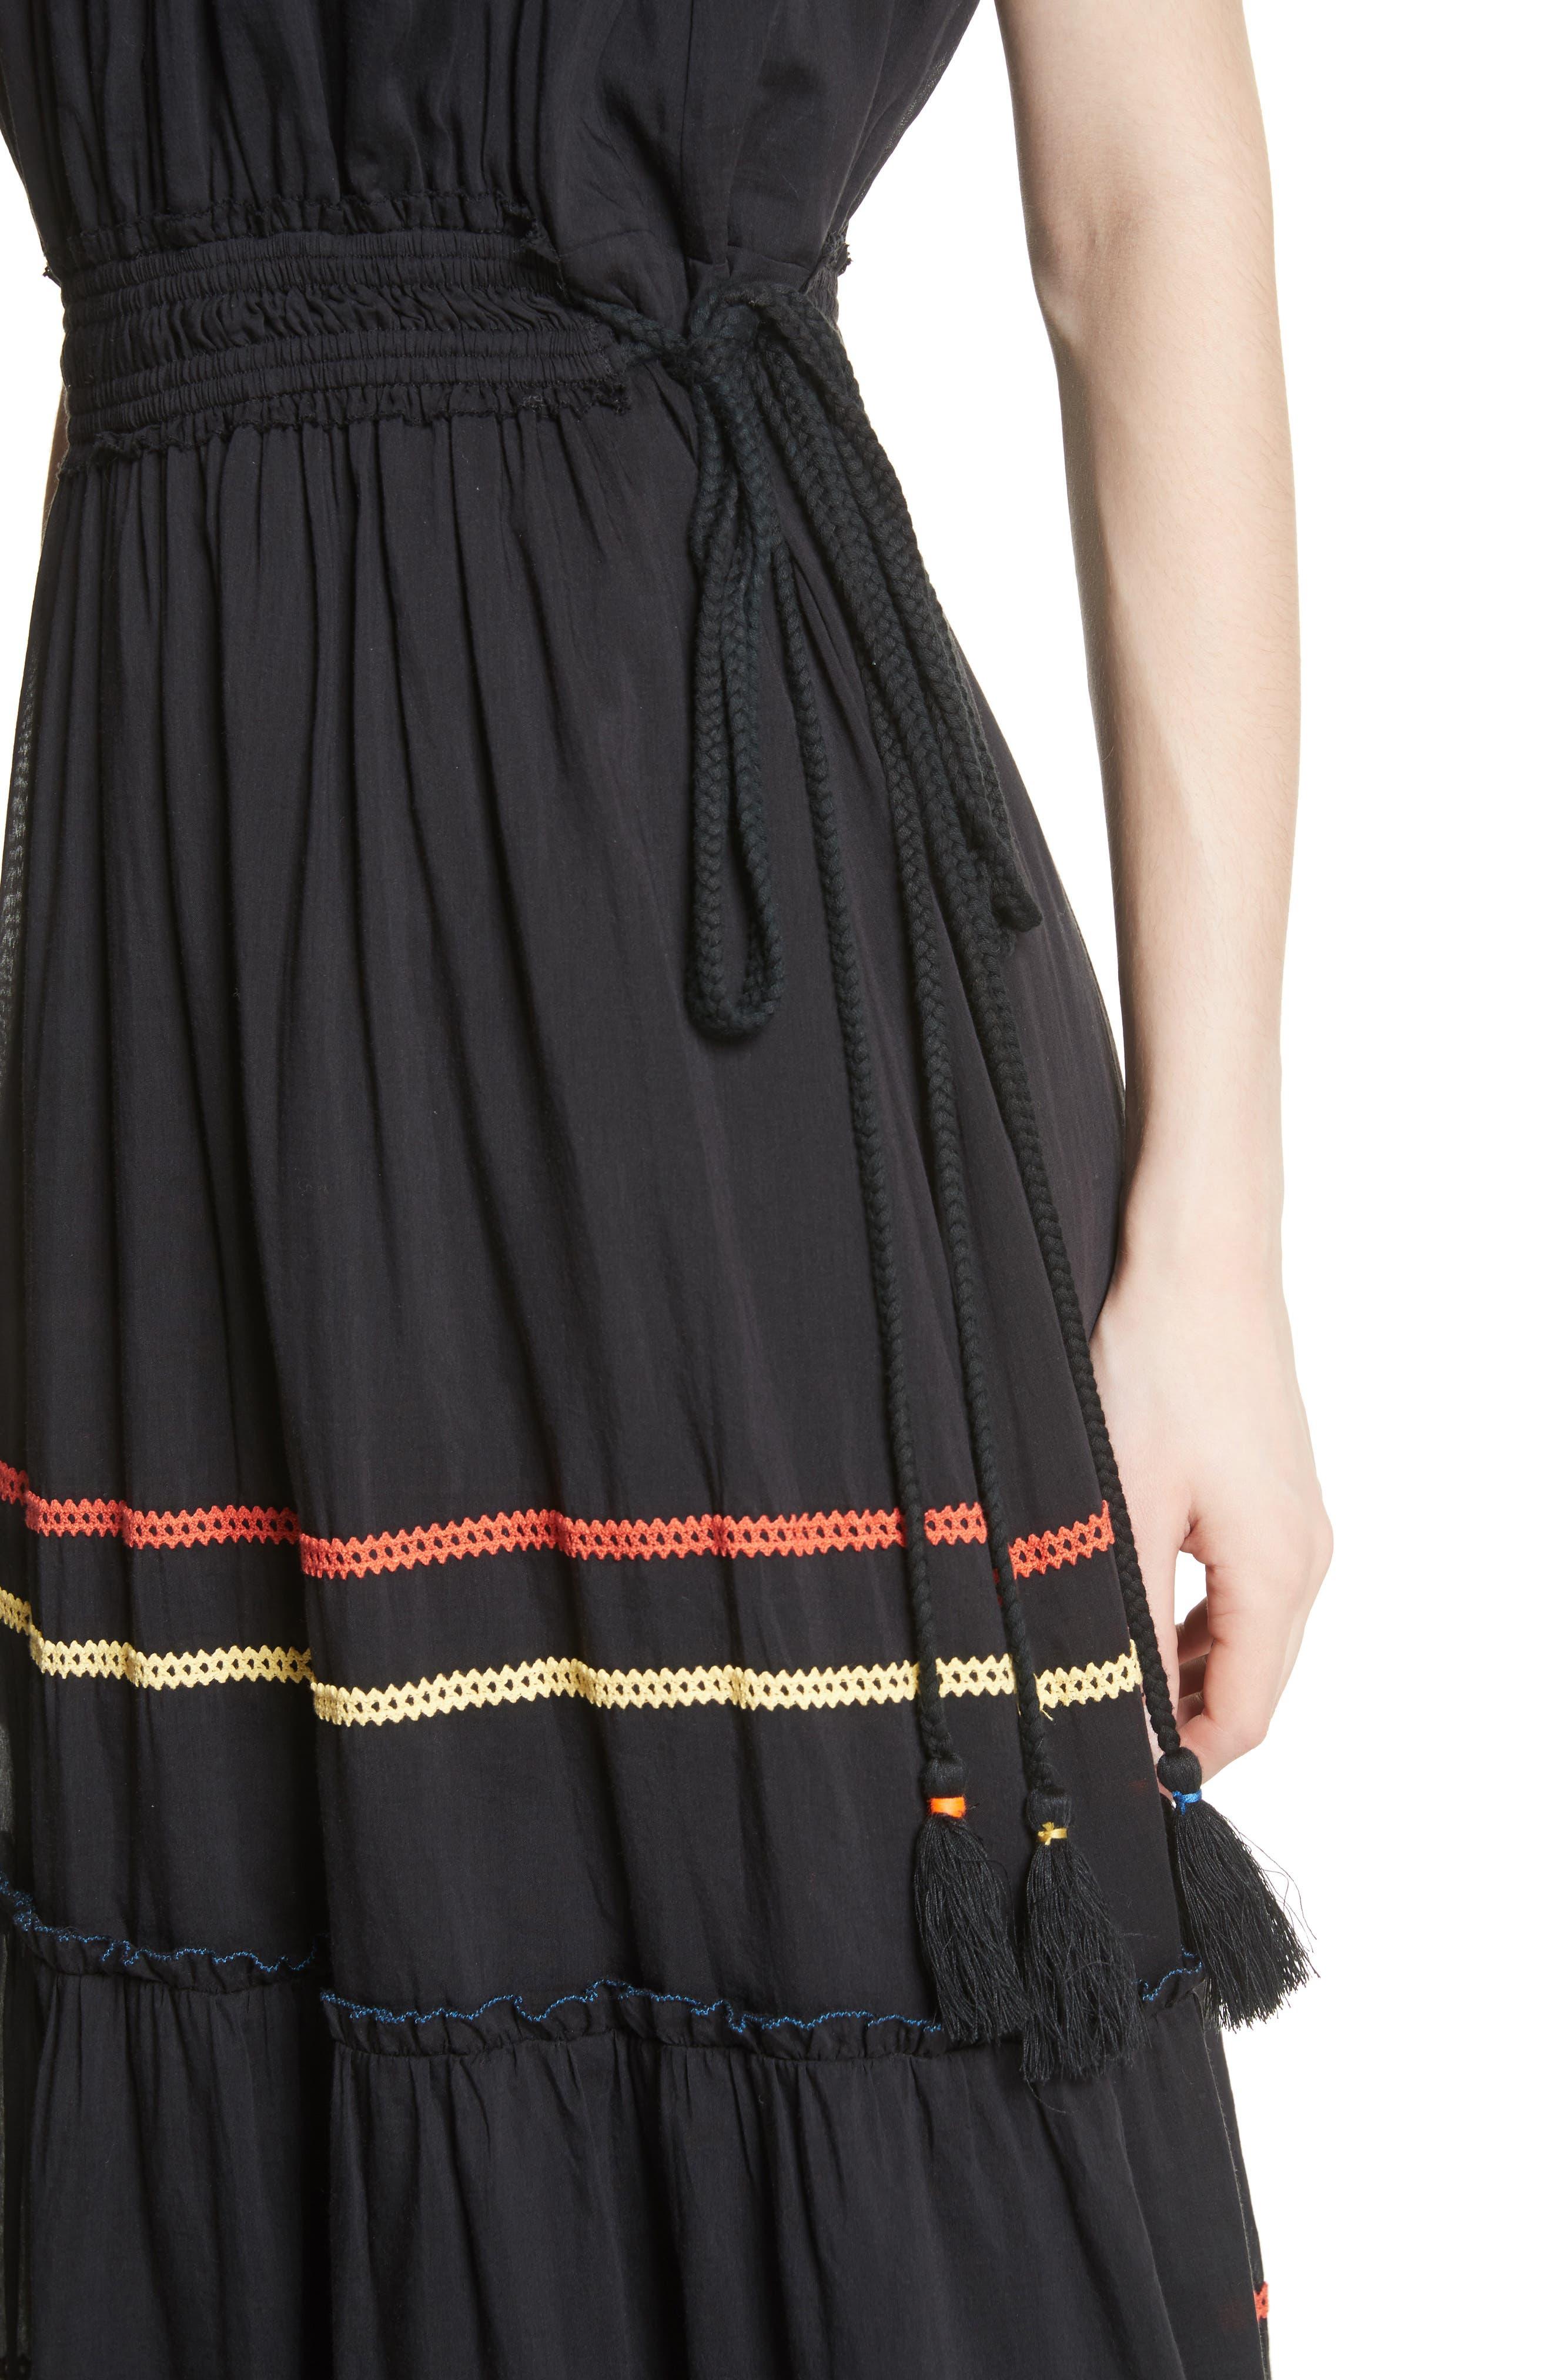 Danit Embroidered Stripe Cotton & Silk Dress,                             Alternate thumbnail 4, color,                             001